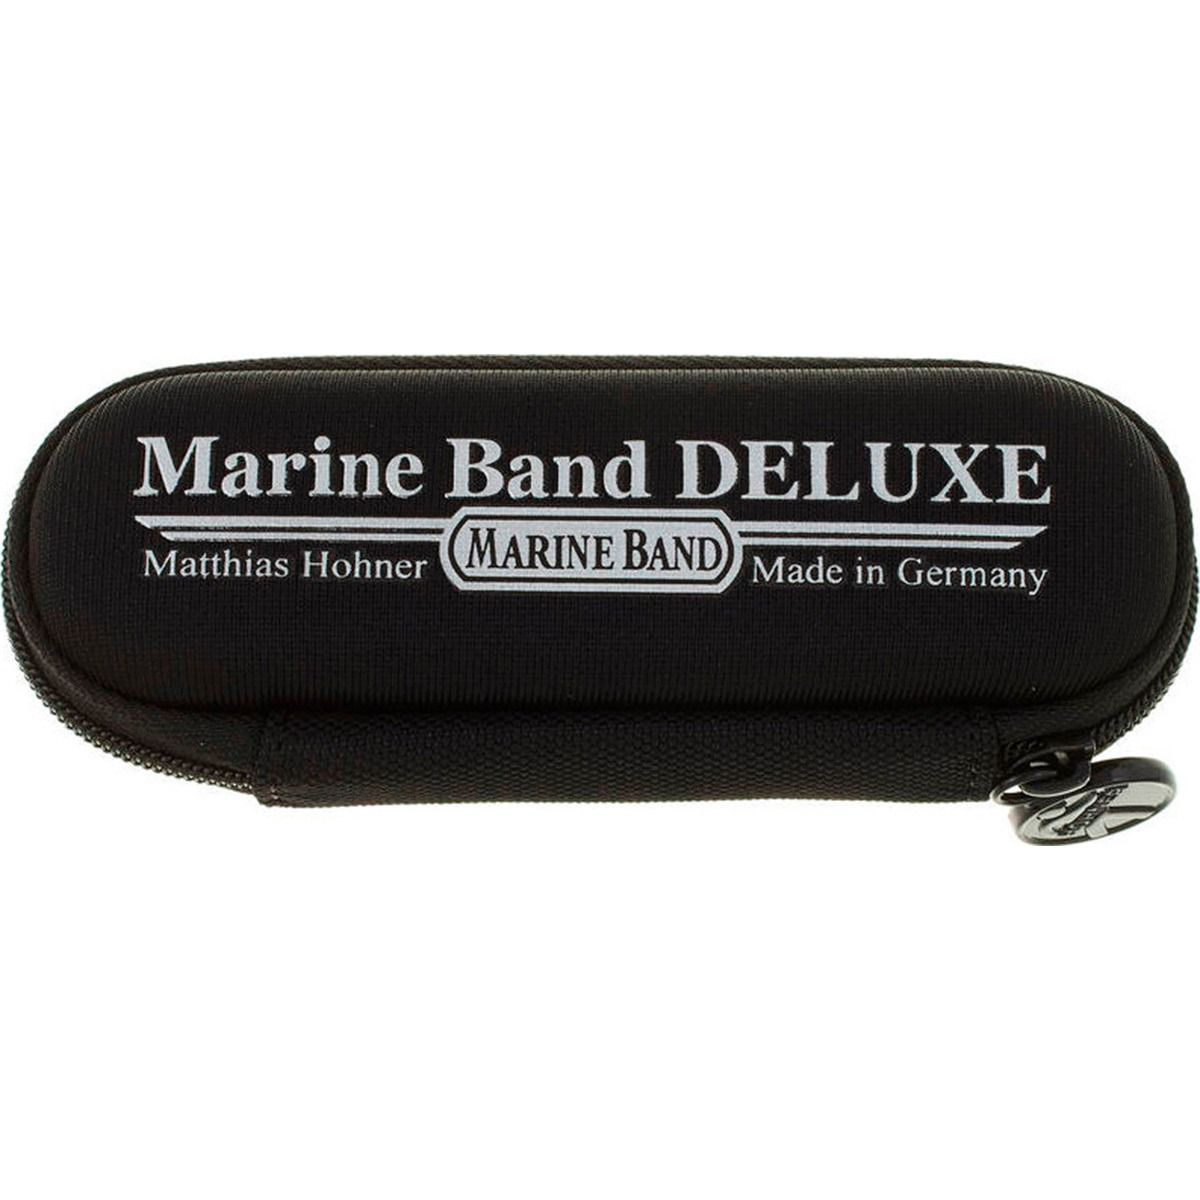 Gaita Harmônica Marine Band Deluxe - C (Dó) - Hohner